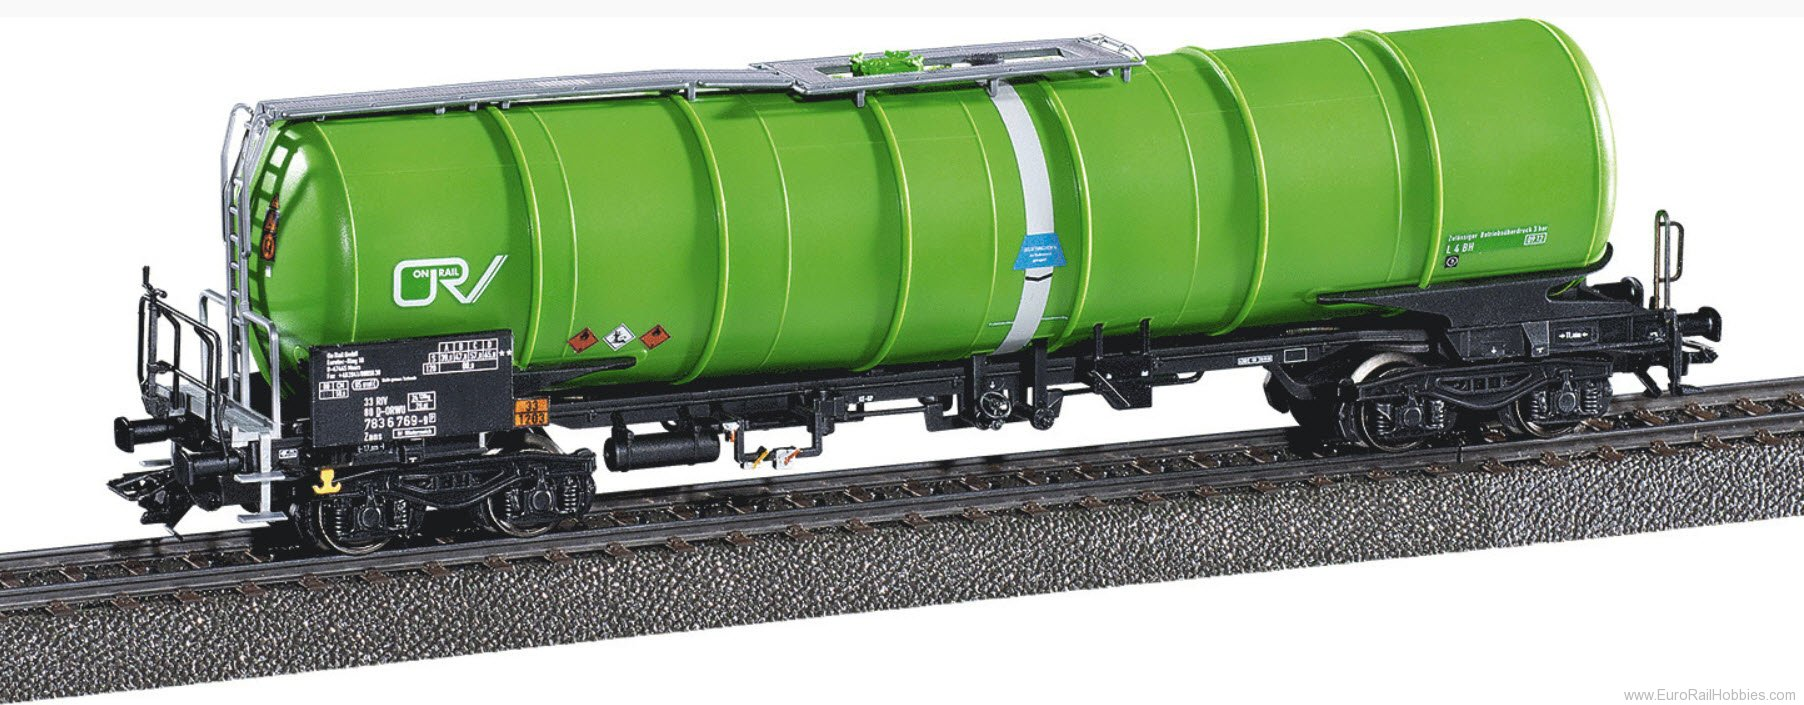 New EuroTrain/Idee & Speil Marklin Special Edition - HO On Rail Type Zans Tank Car